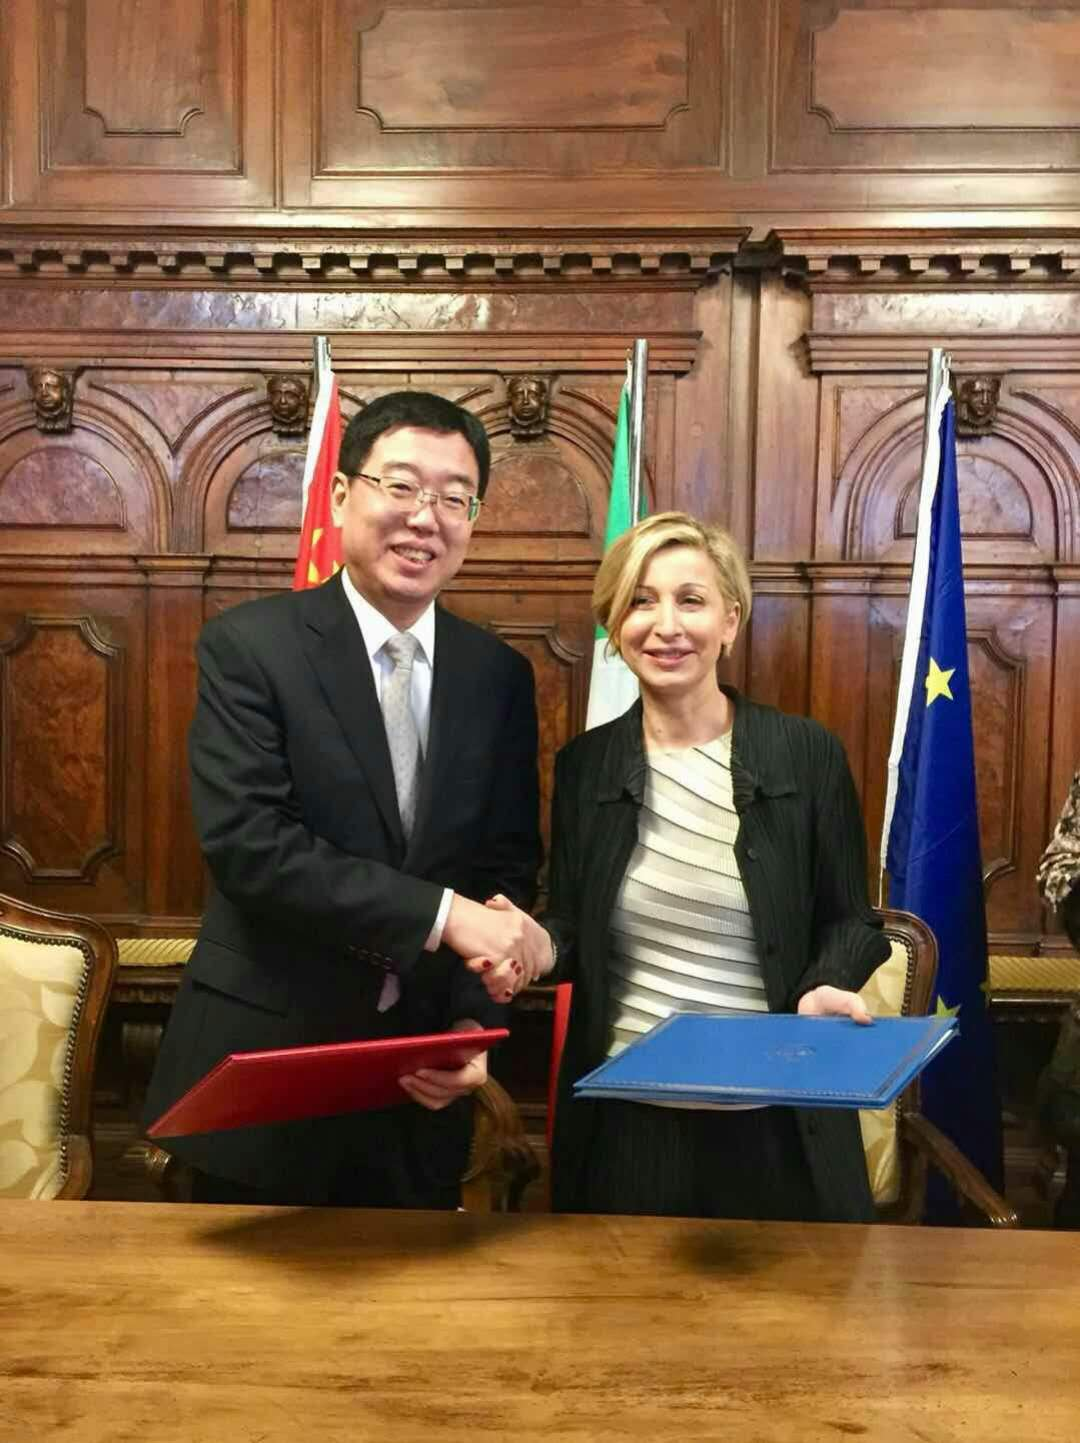 A sinistra il Vice Ministro Du Jiang, a destra la Sottosegretaria Dorina Bianchi